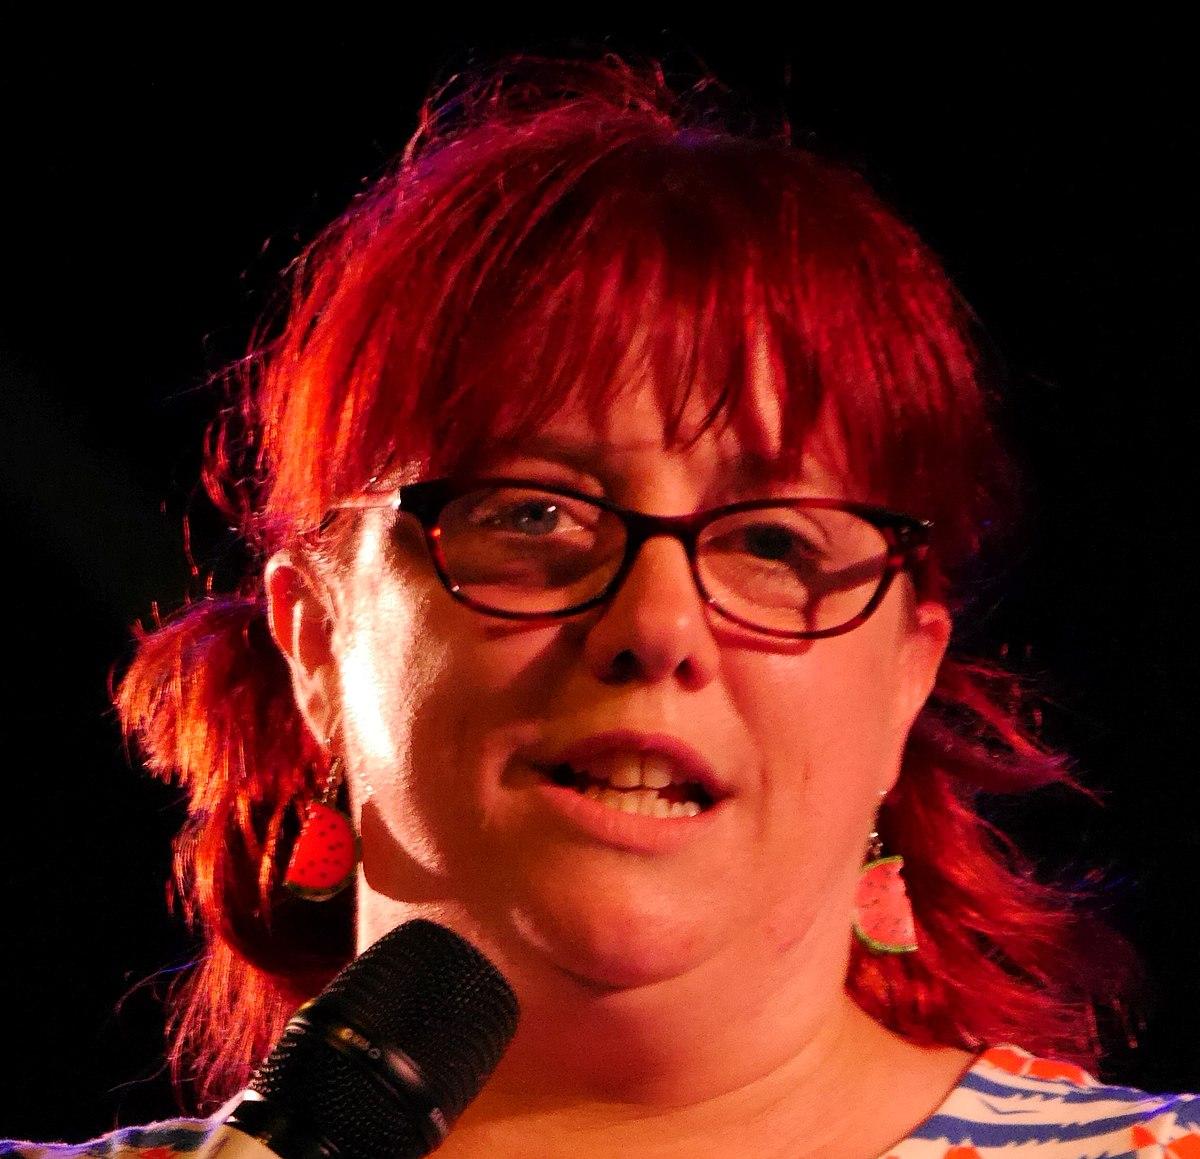 Angela Barnes - Wikipedia